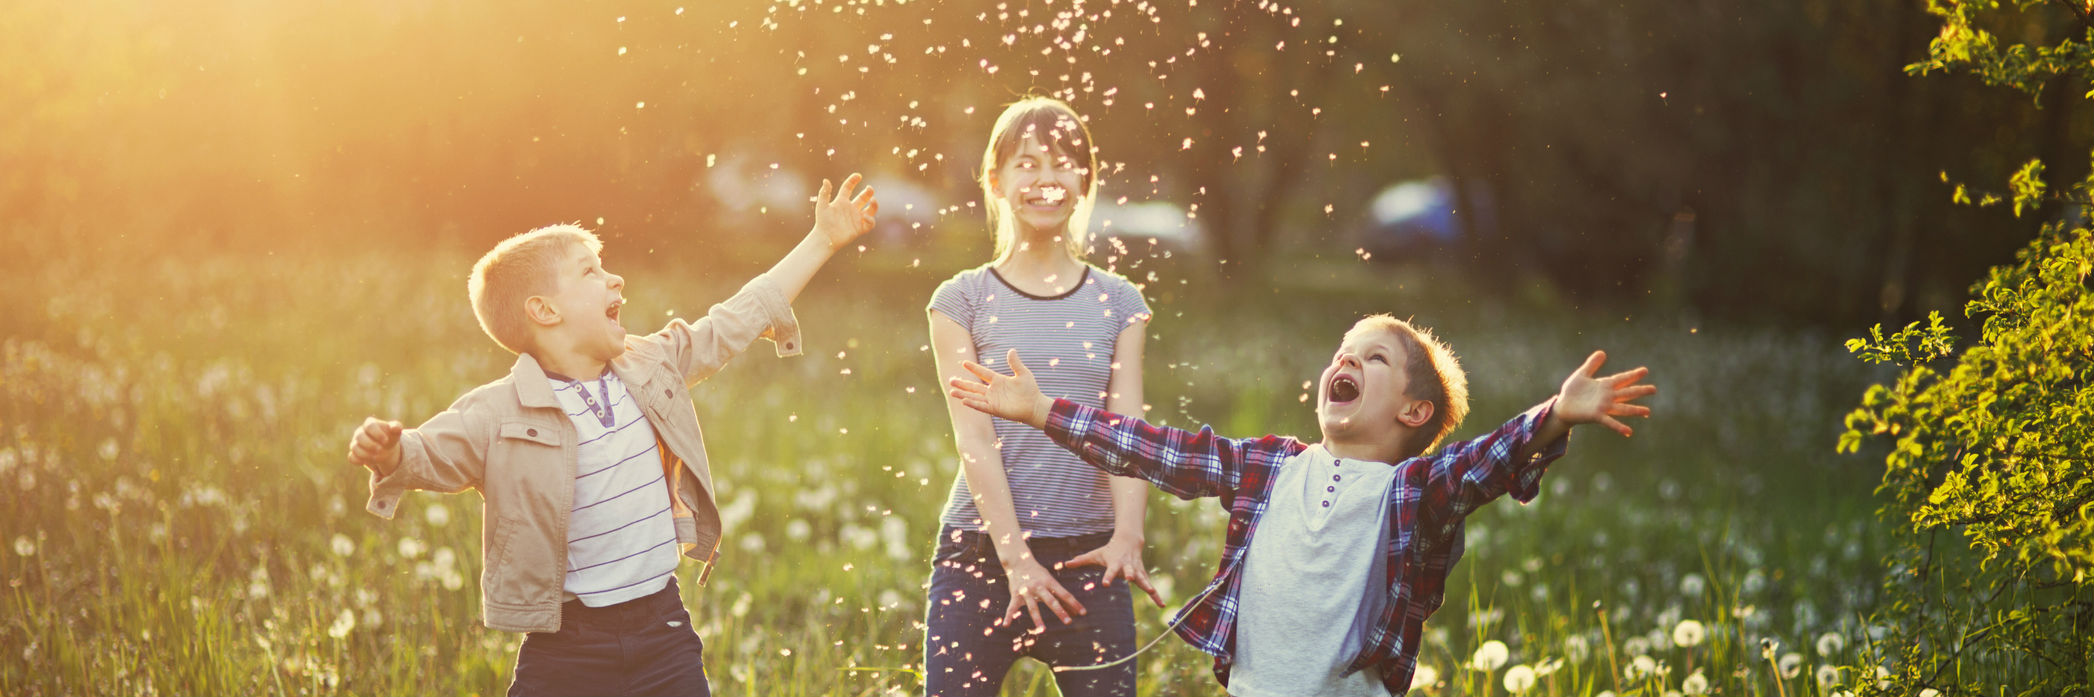 Spring break ideas for country kids